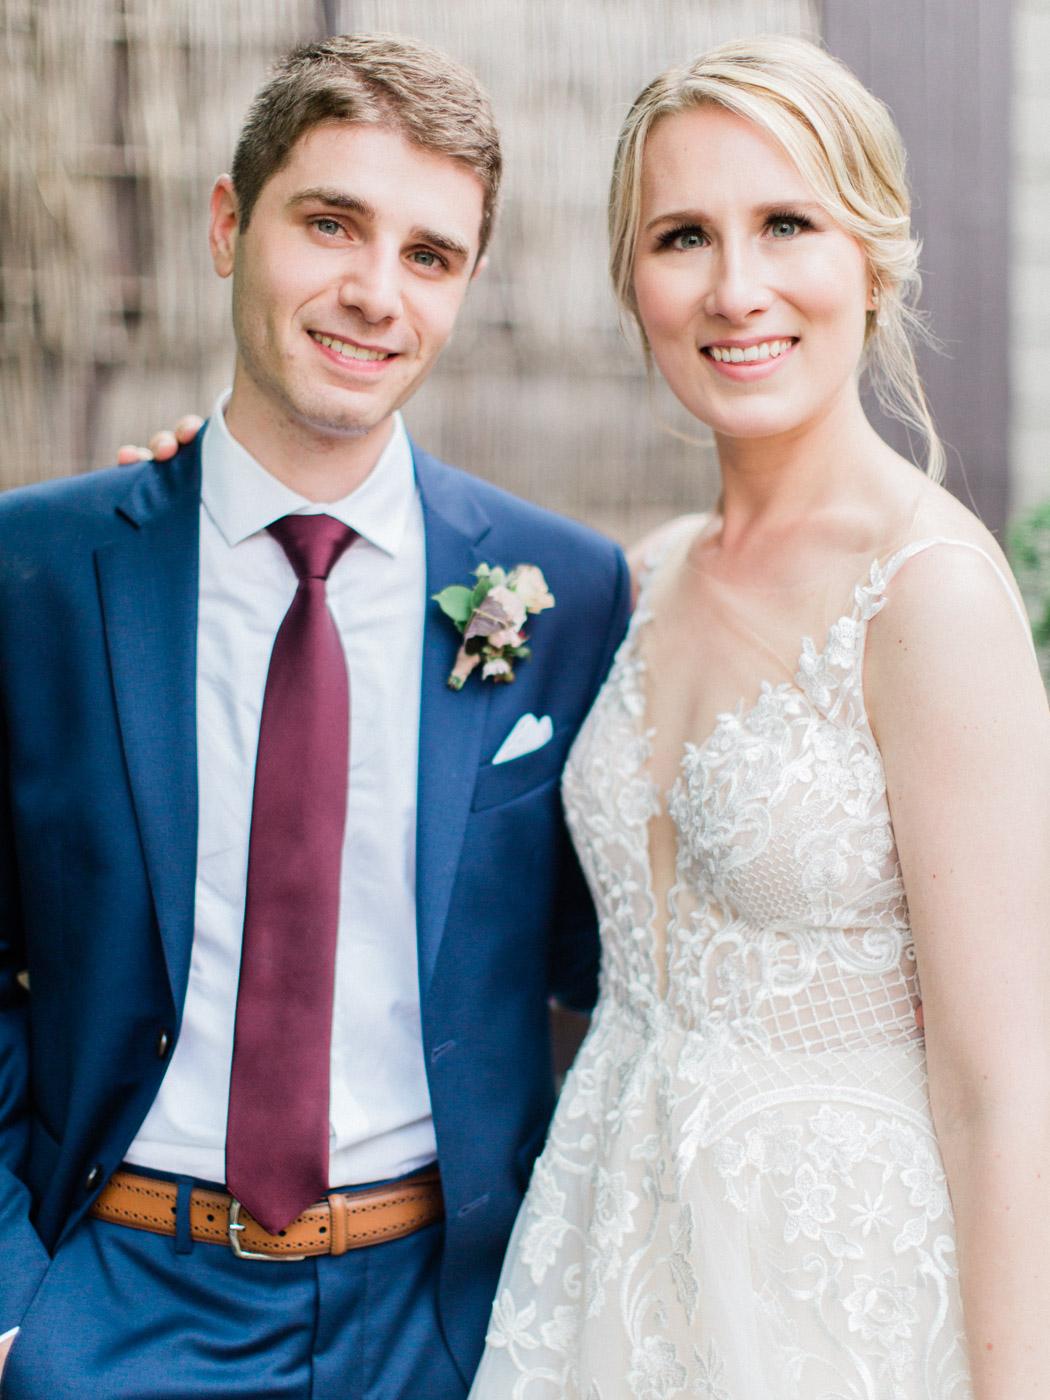 downtown-toronto-wedding-photographer-berkley-fieldhouse-blush-439.jpg